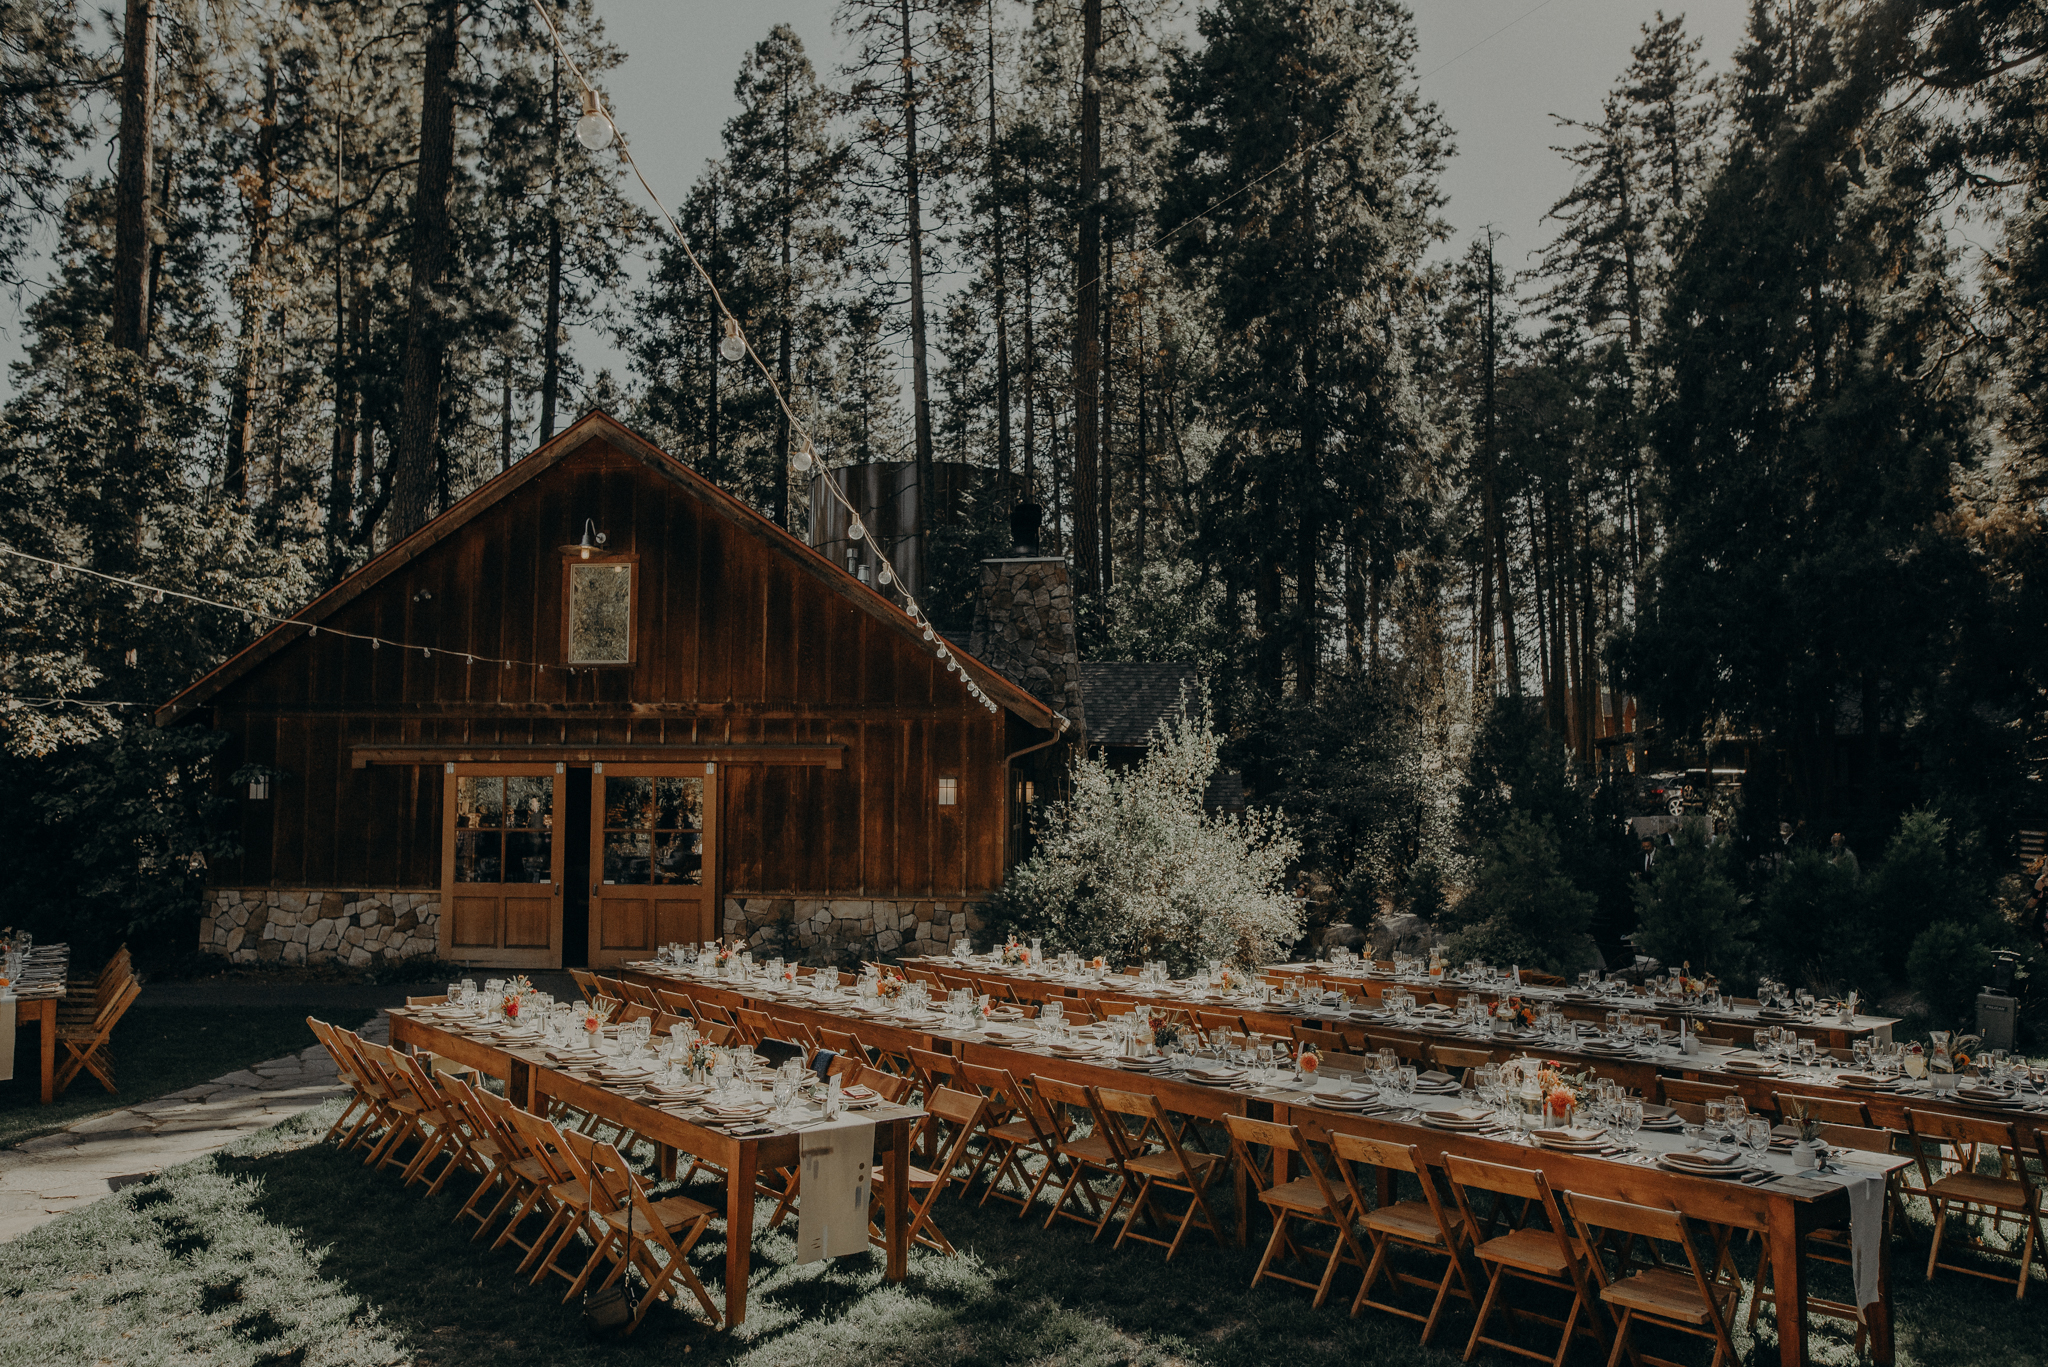 Yosemite Elopement Photographer - Evergreen Lodge Wedding Photographer - IsaiahAndTaylor.com-117.jpg